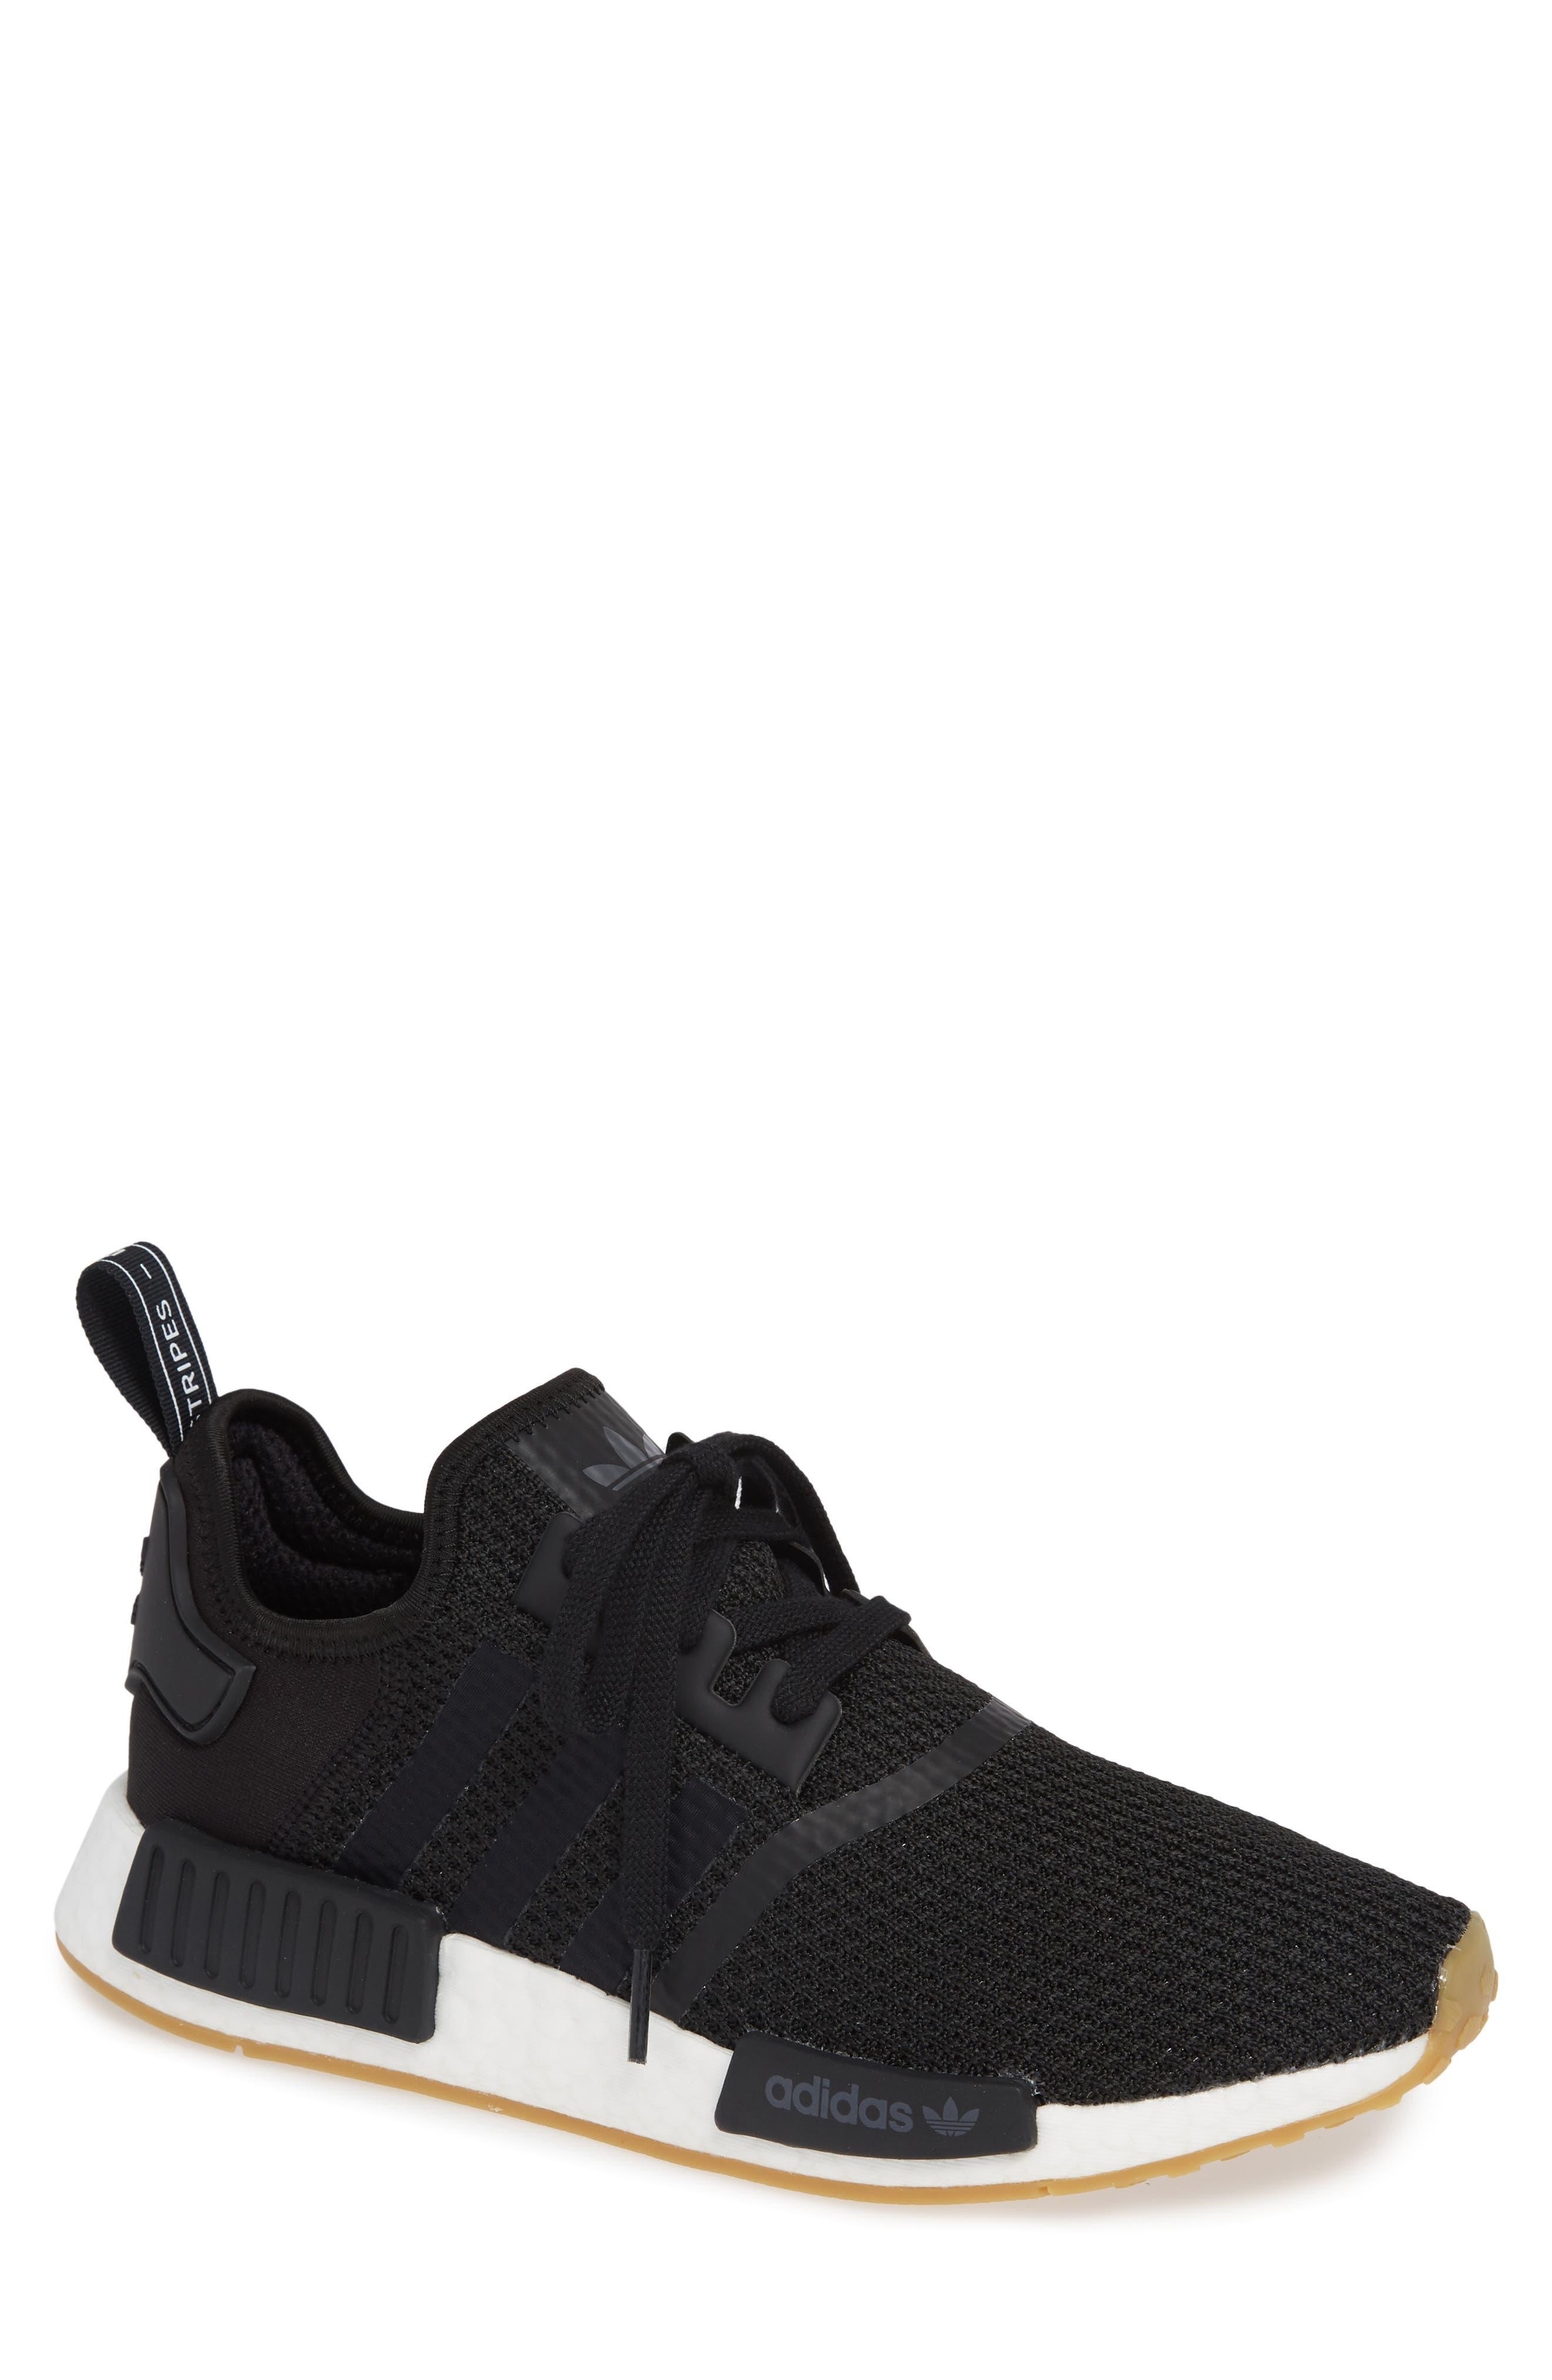 Originals NMD R1 Sneaker,                         Main,                         color, BLACK/ BLACK/ GUM